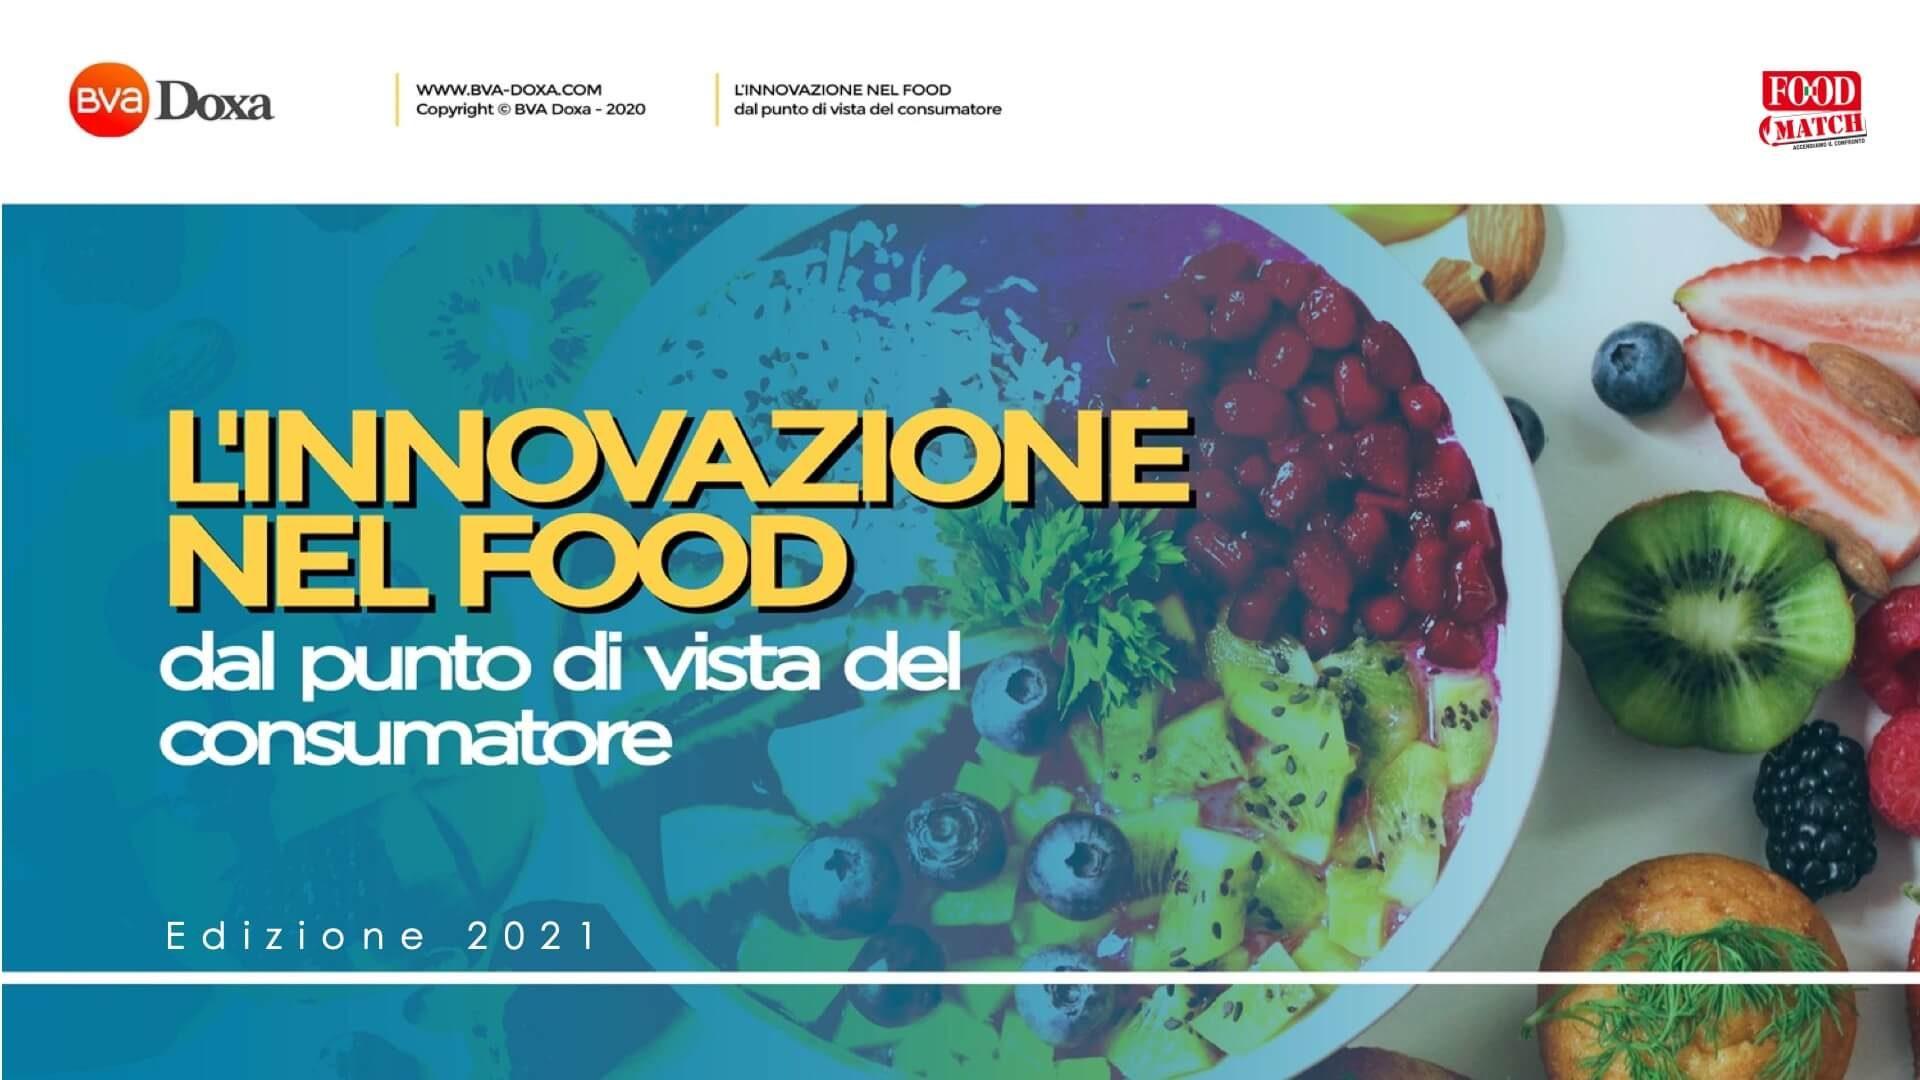 Food Innovation Conti Doxa Bva 01